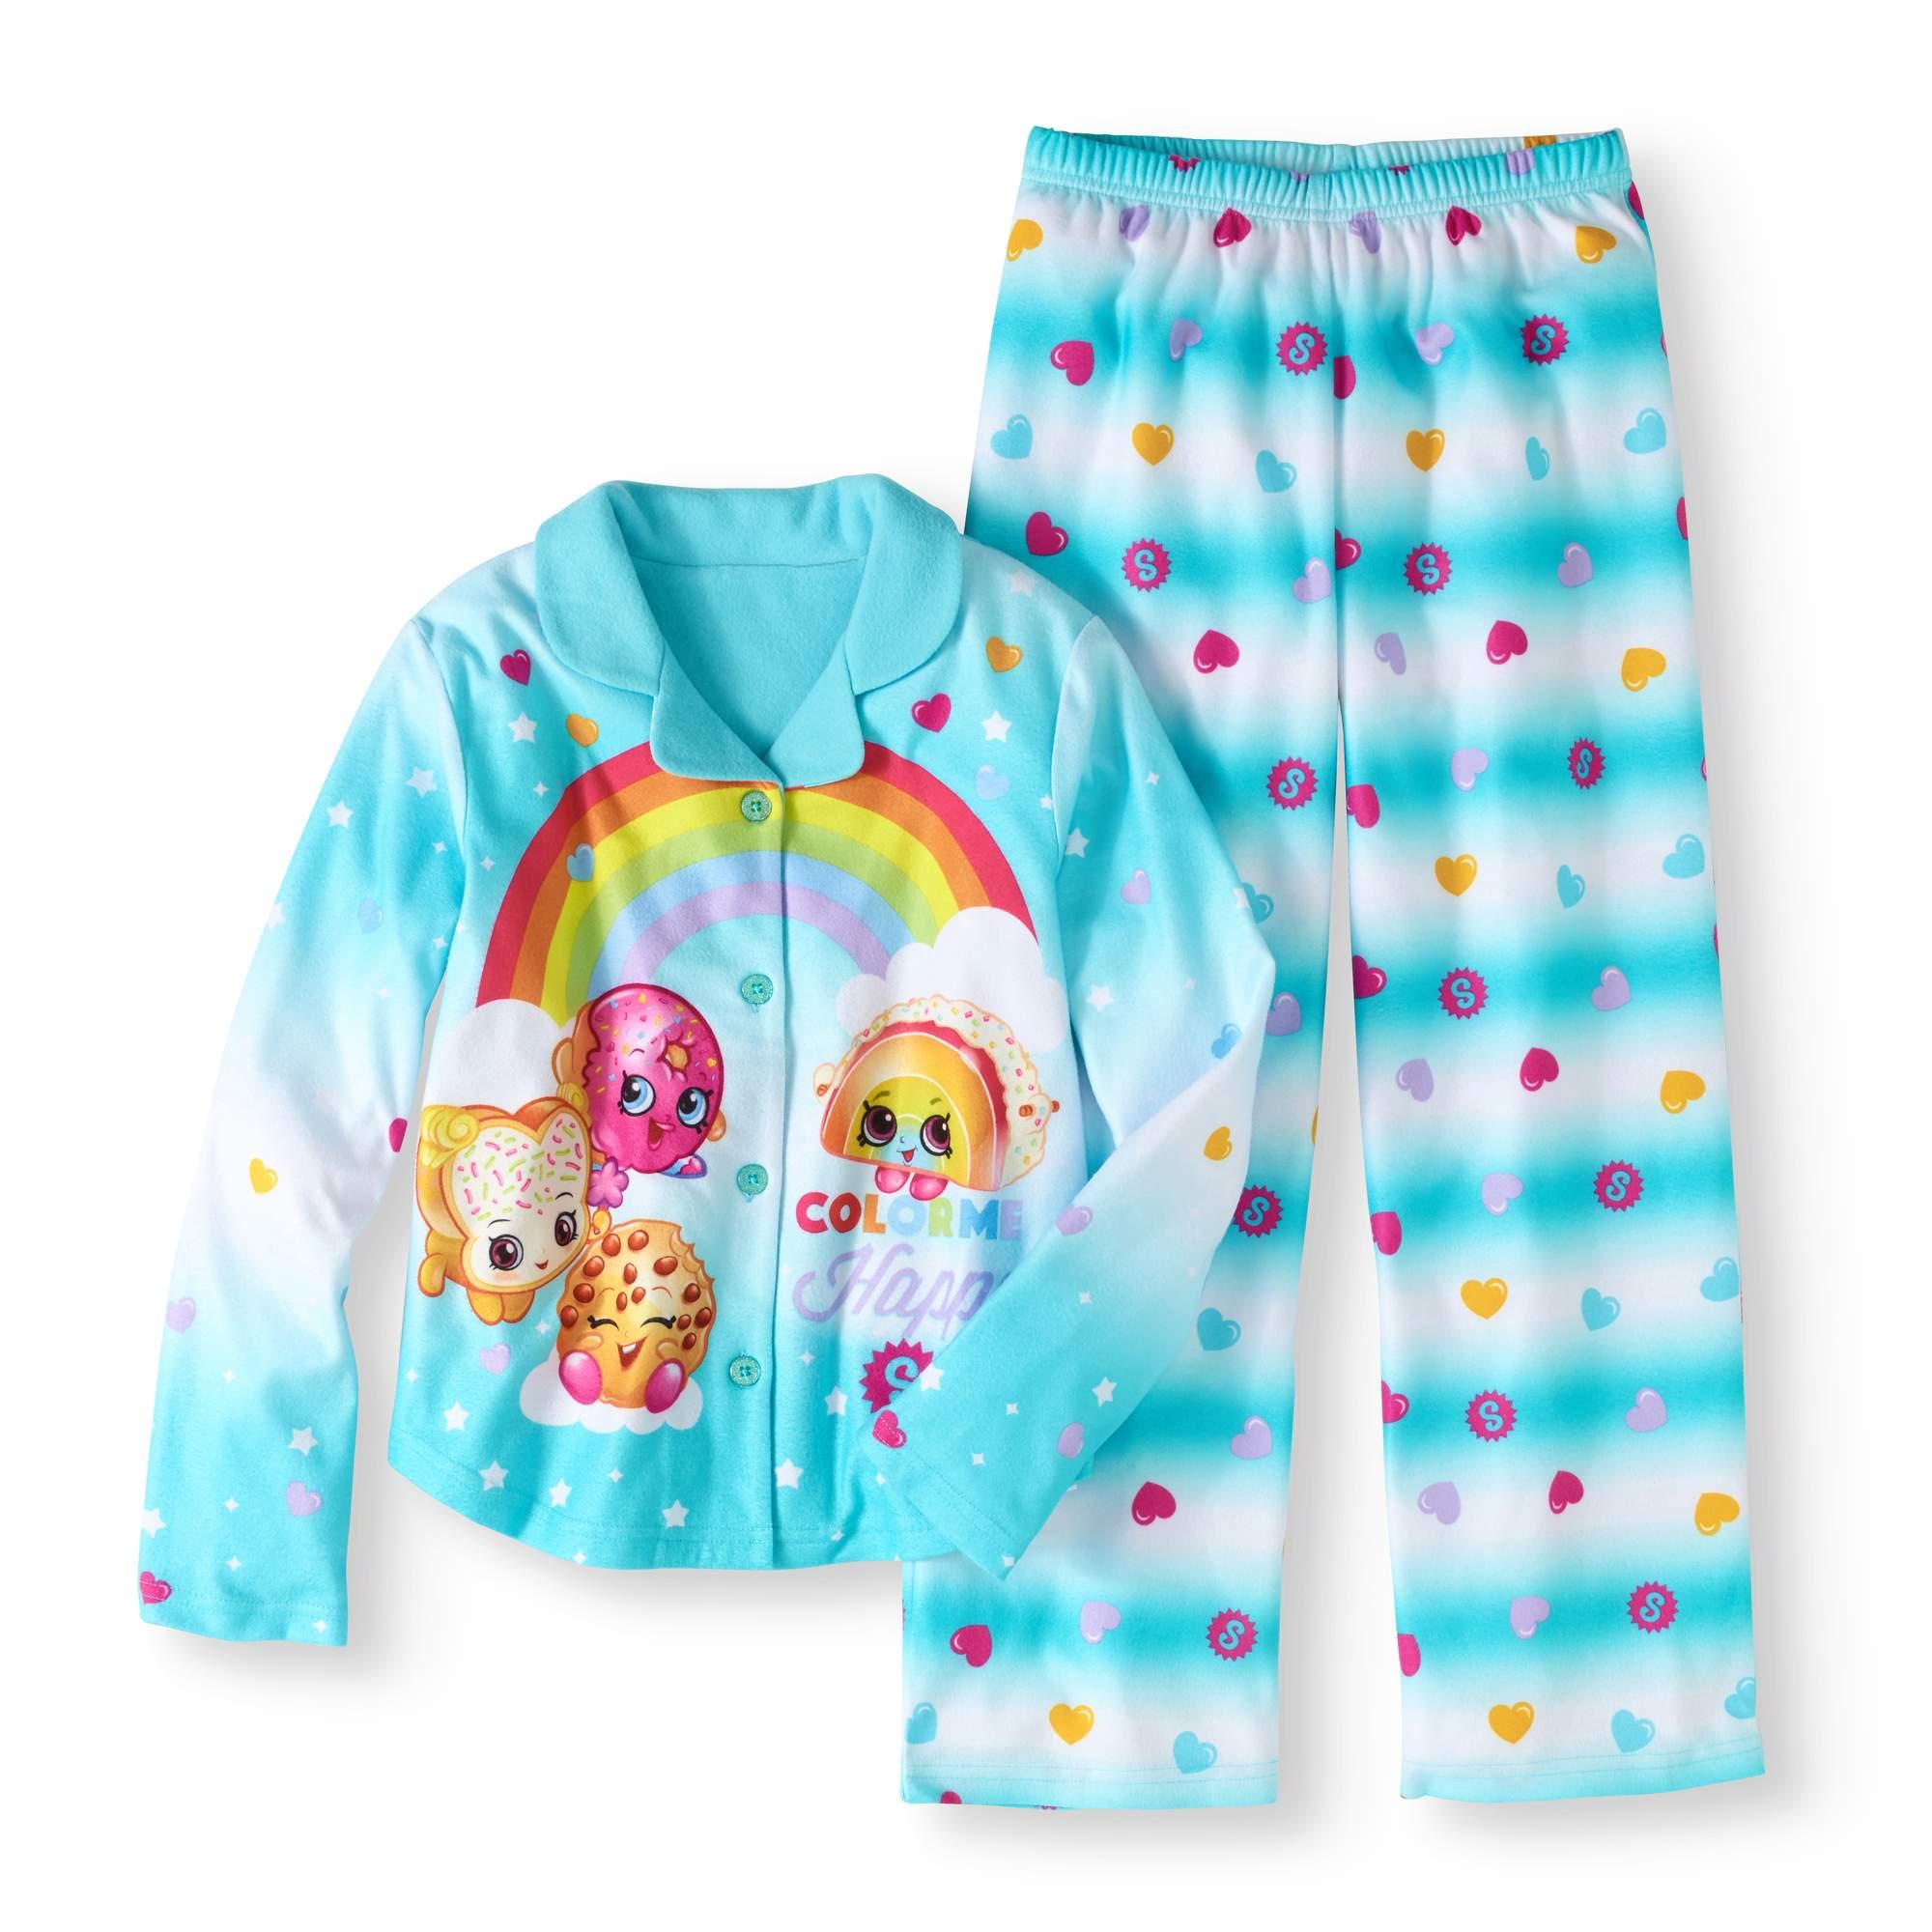 Girls' Button Down Top and Bottom Pajama 2-Piece Set